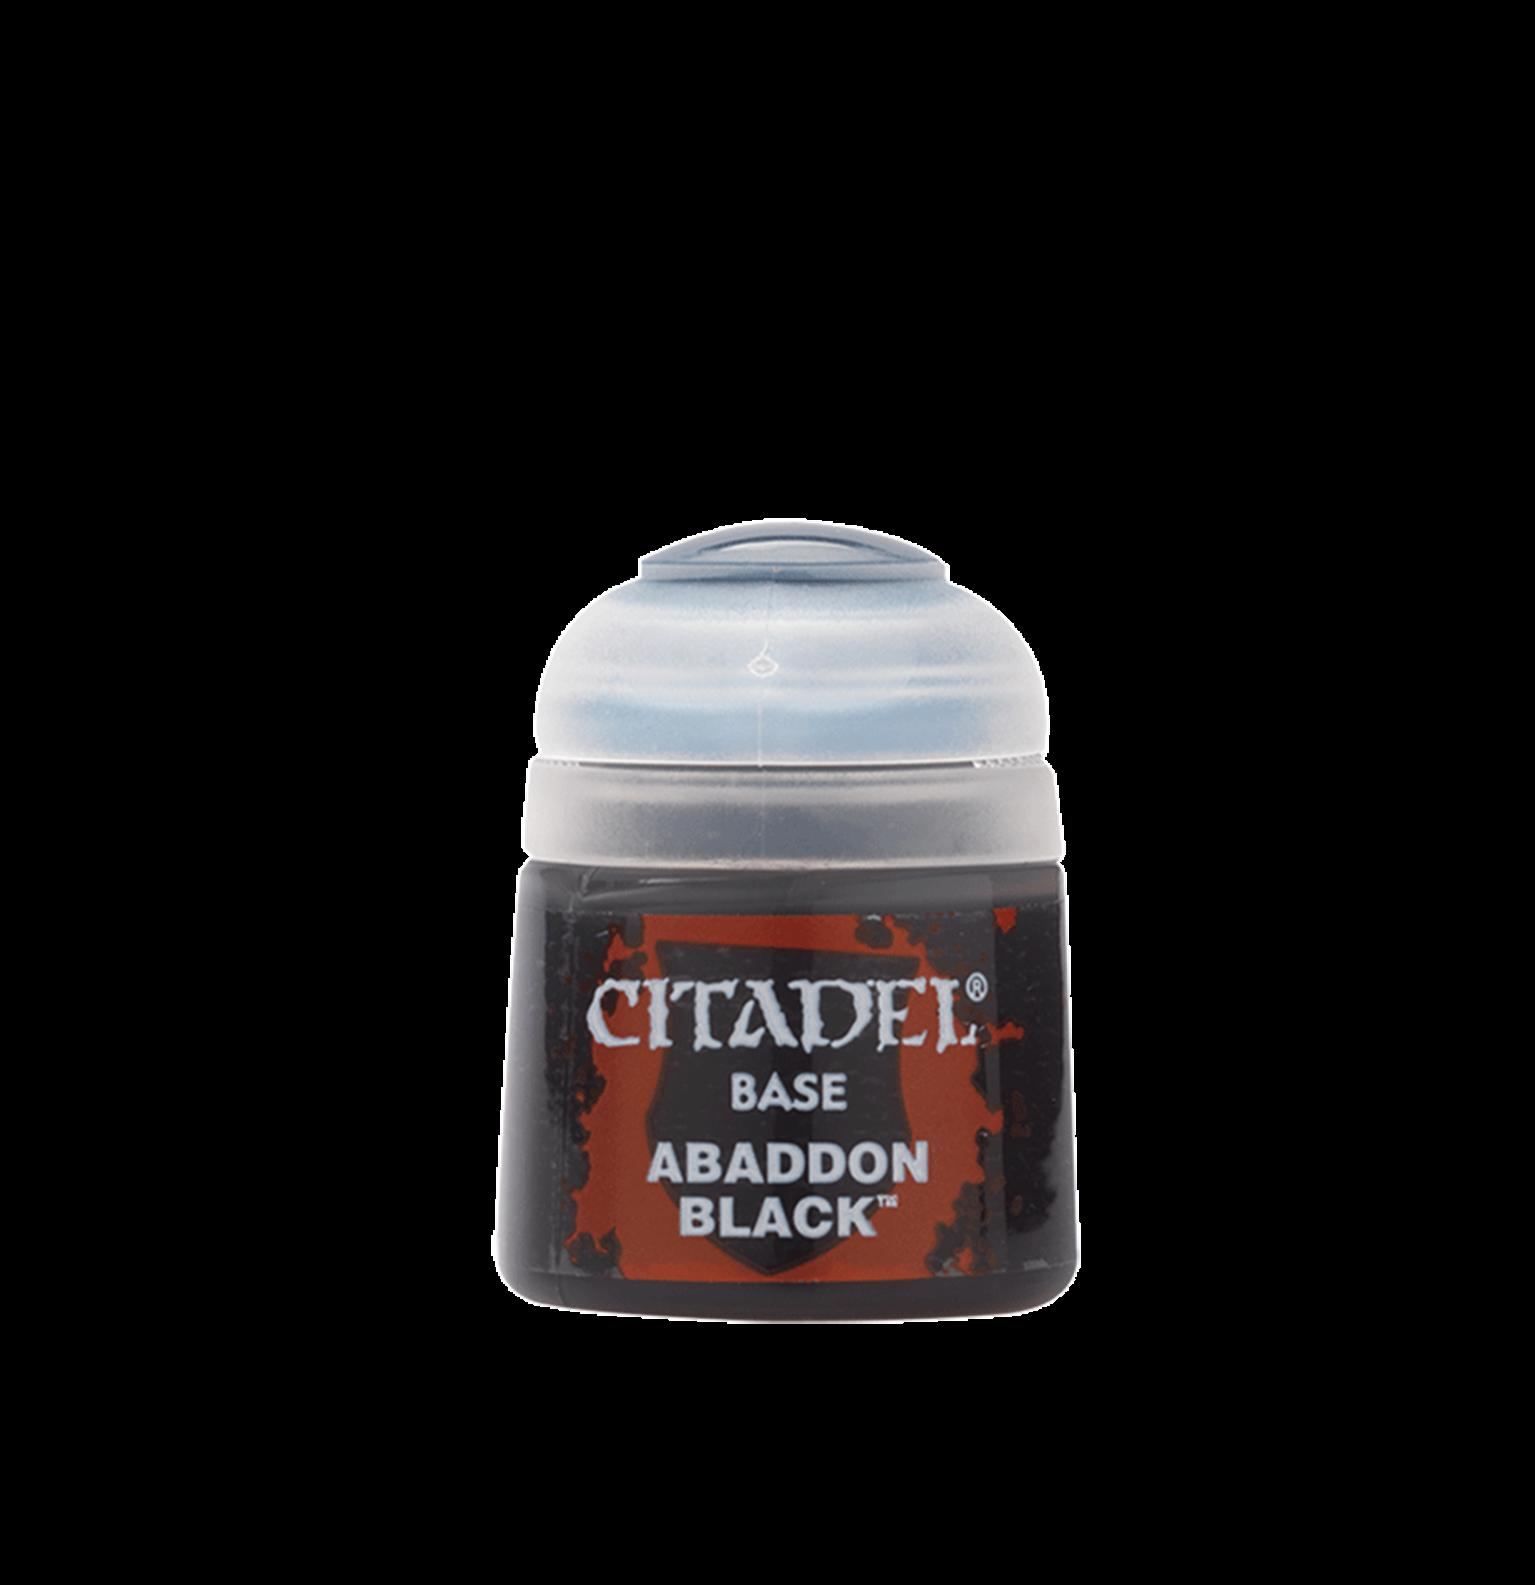 Citadel Base Abandon Black Paint Pot